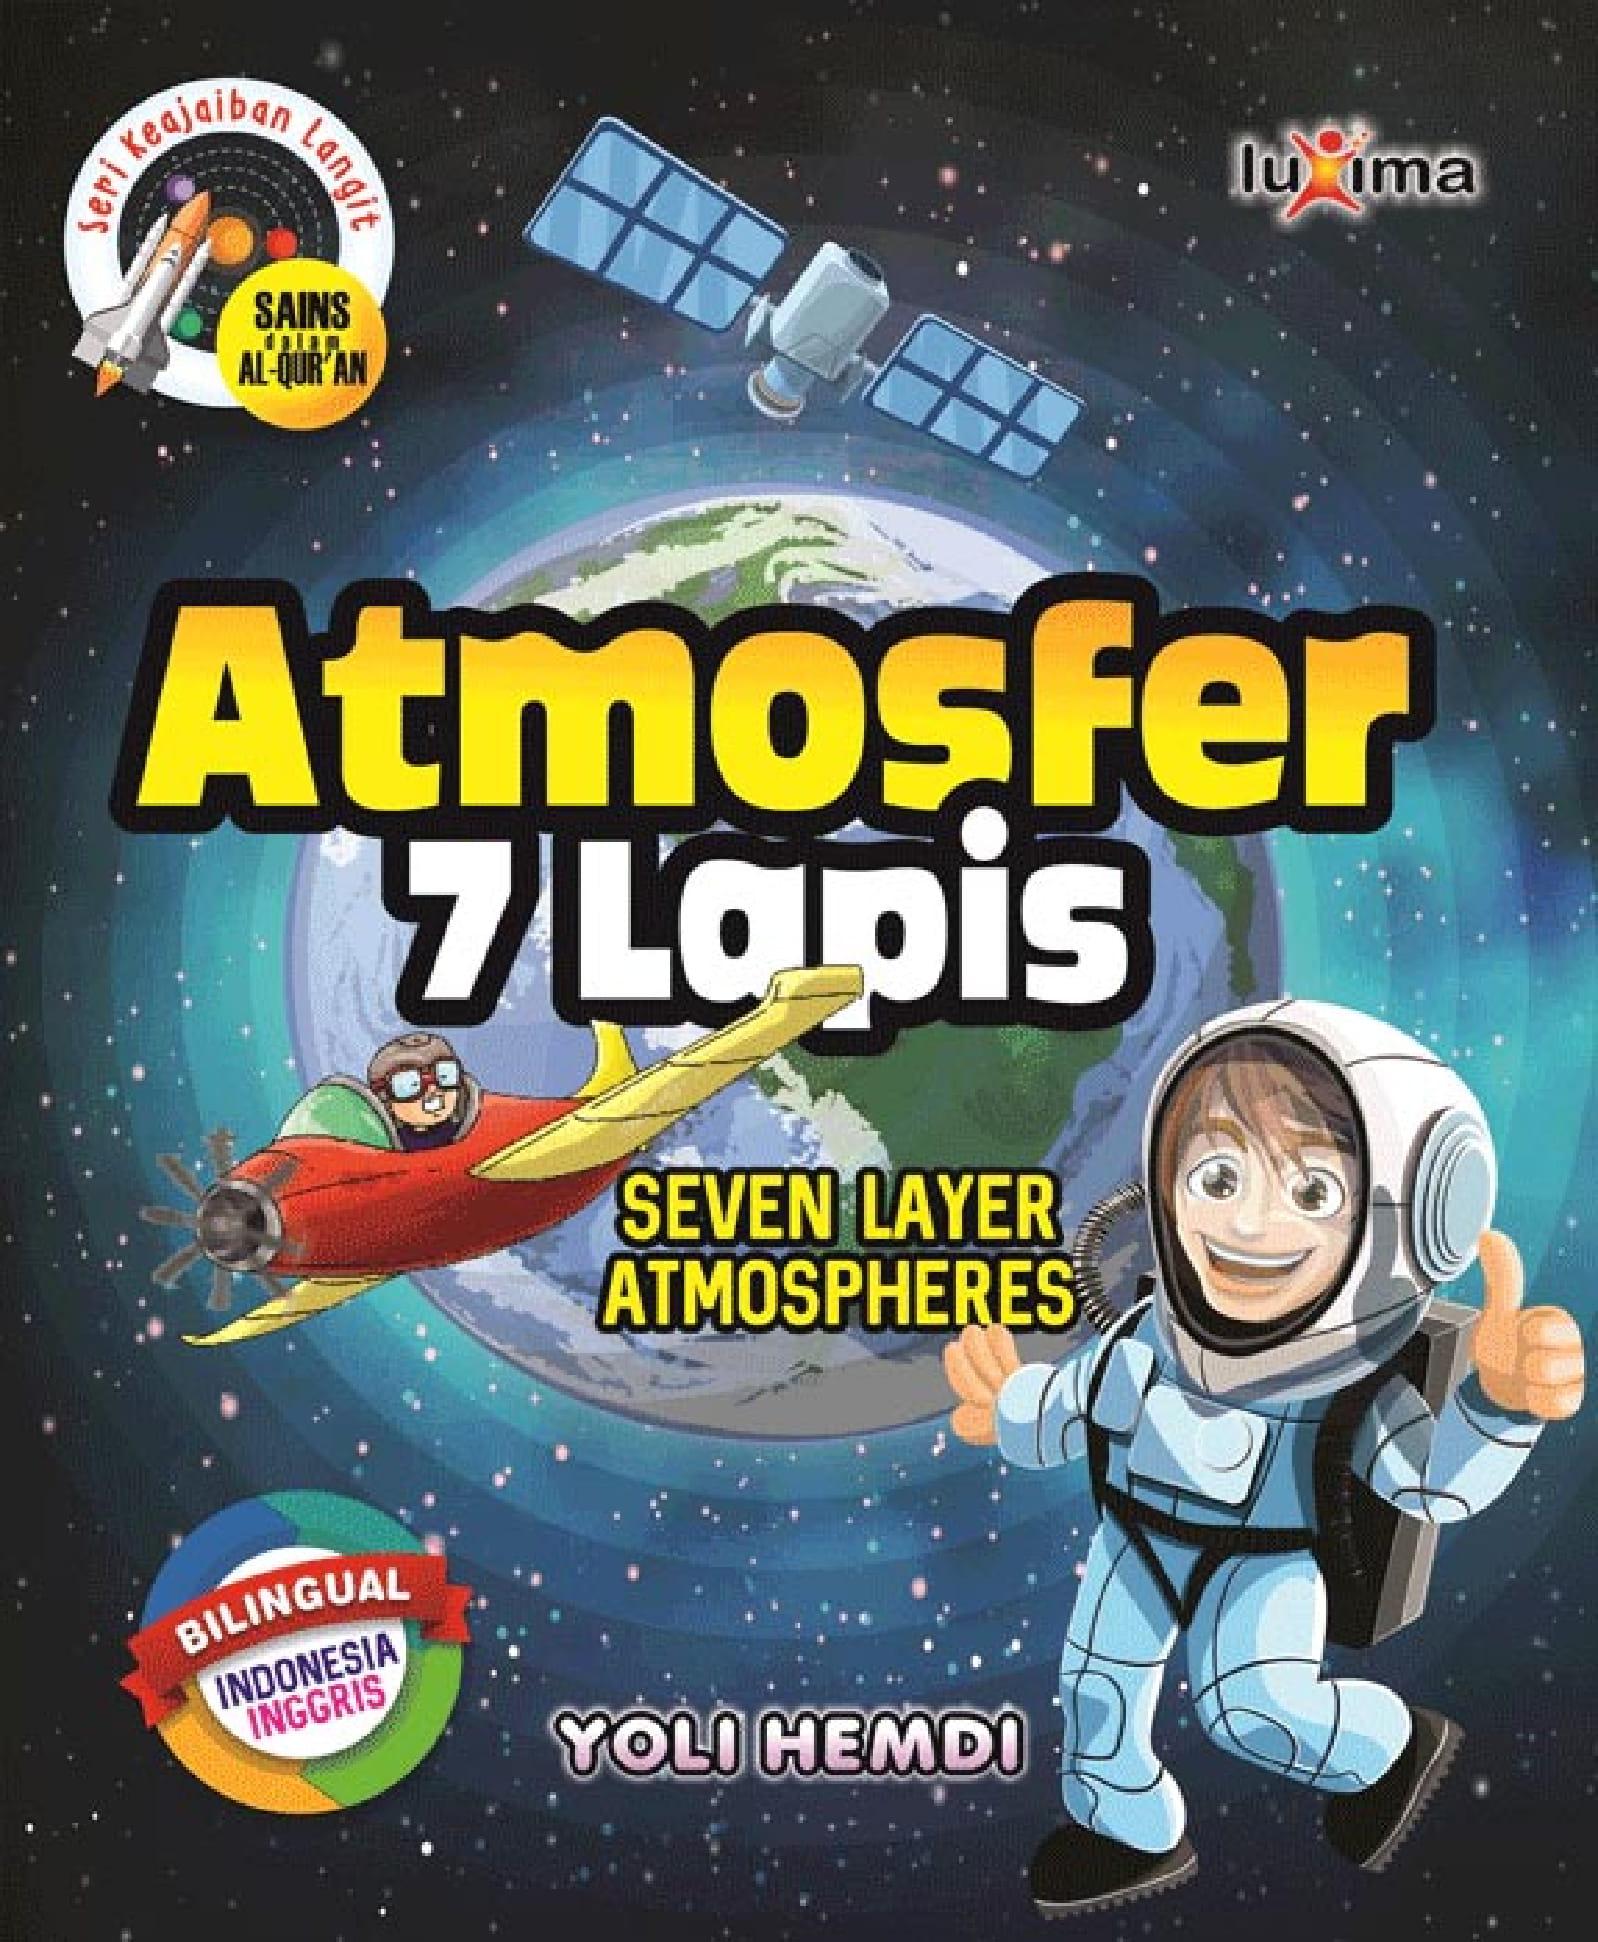 Atmosfer 7 lapis [sumber elektronis] = Seven layer atmospheres